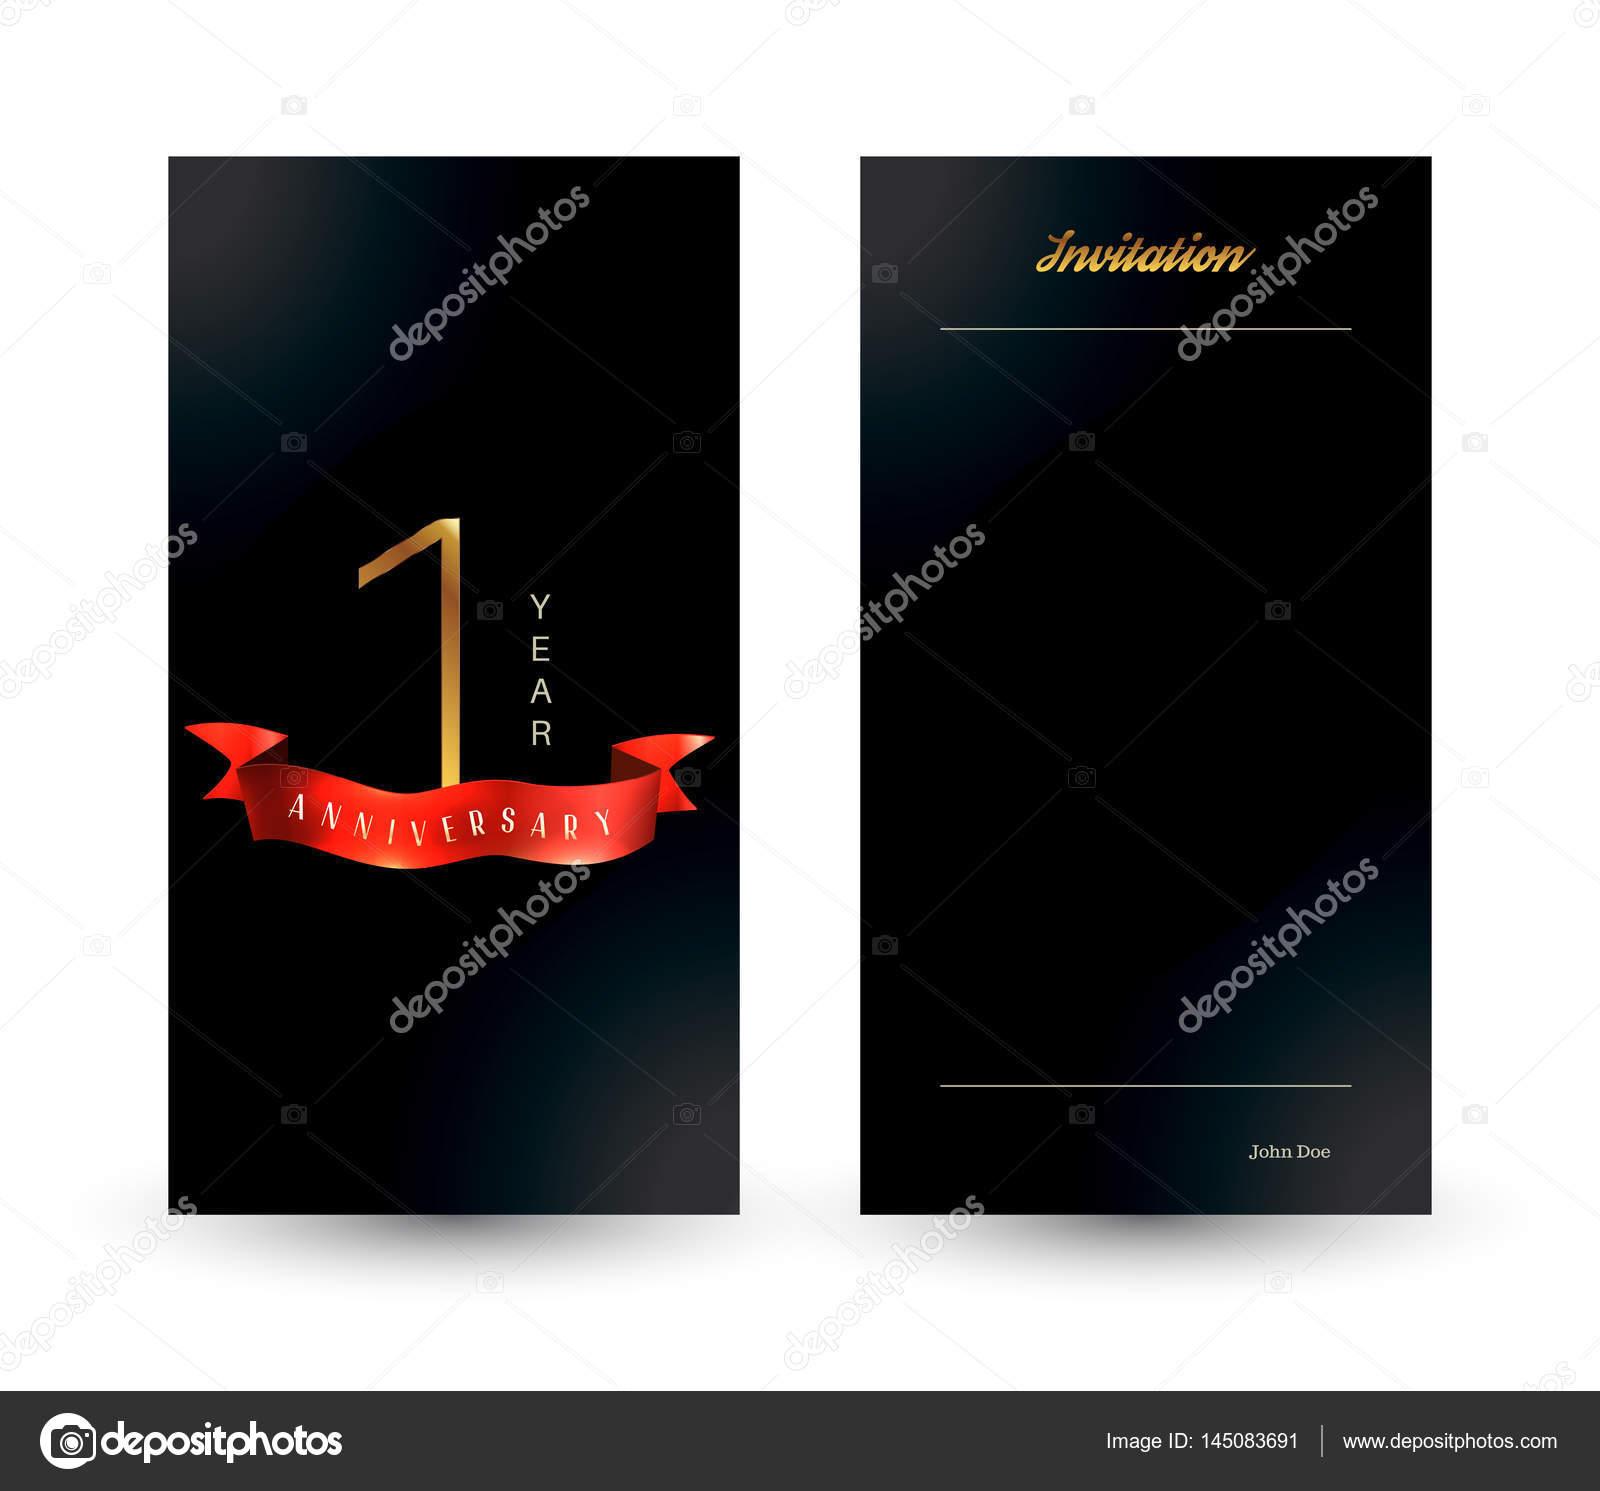 1st Anniversary Decorated Greetinginvitation Card Template Stock